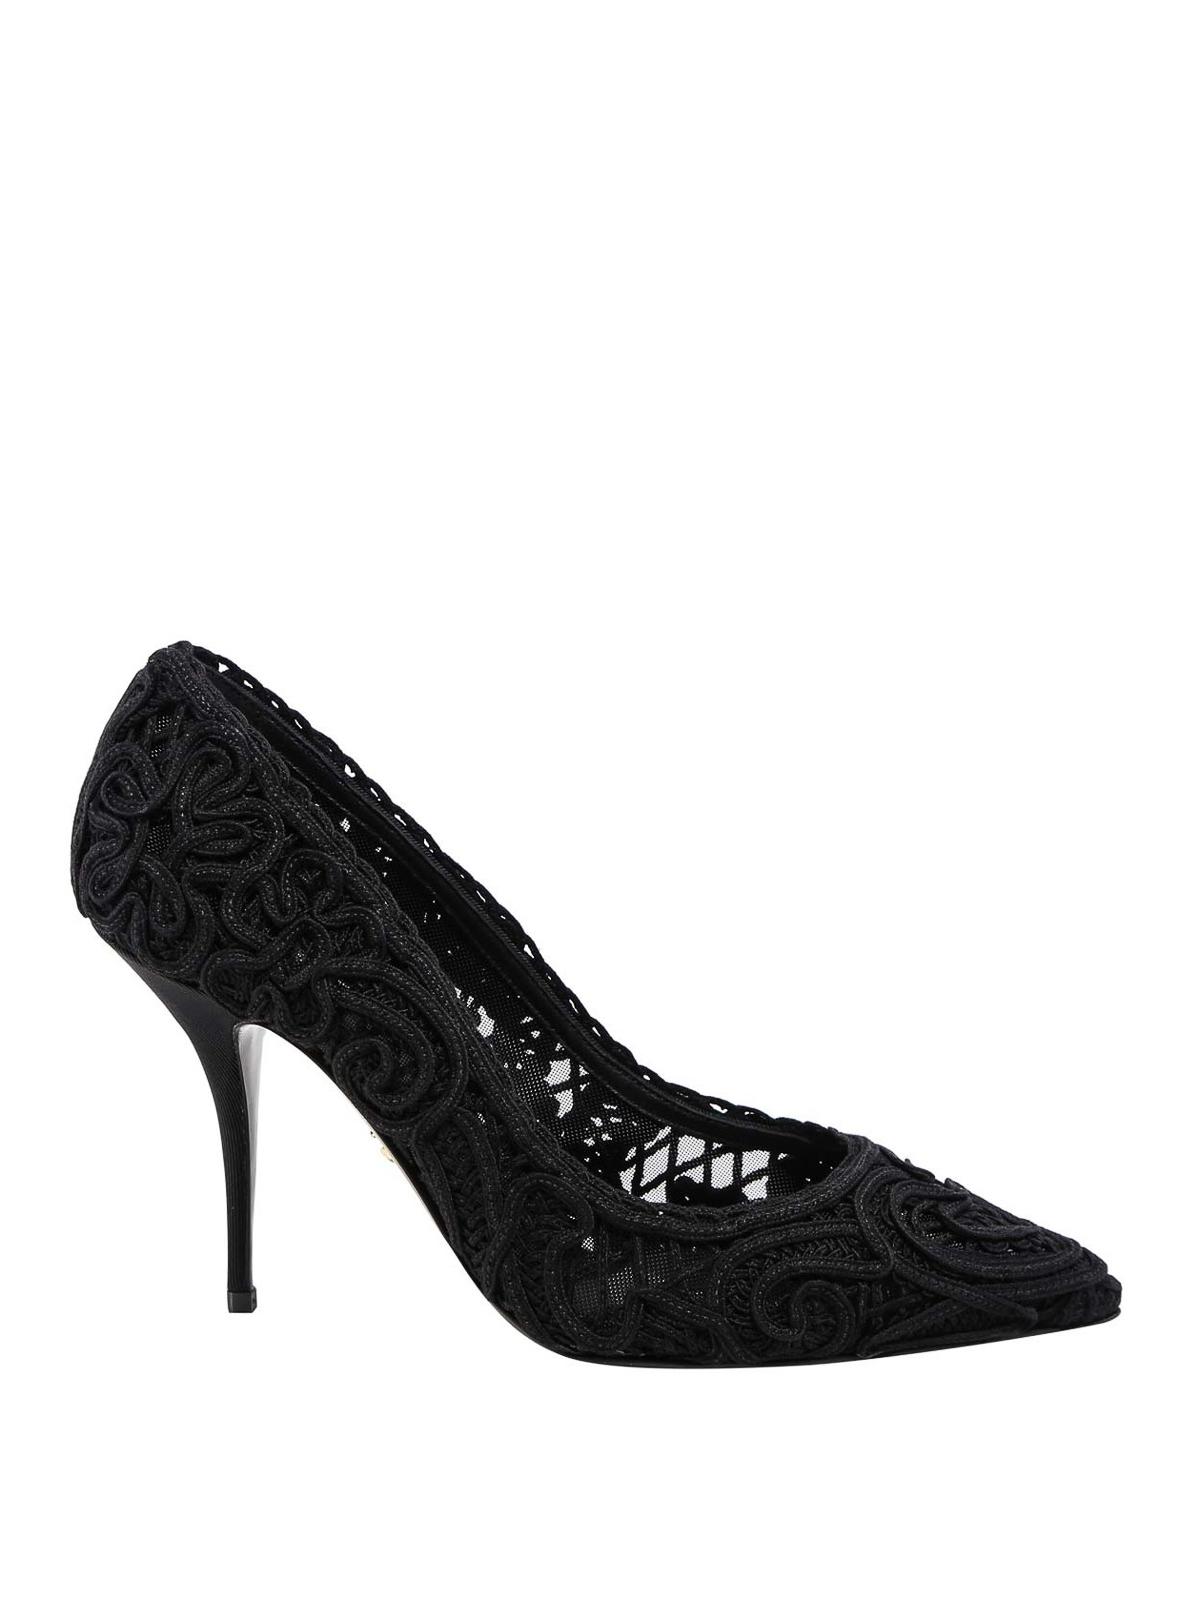 Dolce & Gabbana CARDINALE 90 PUMPS